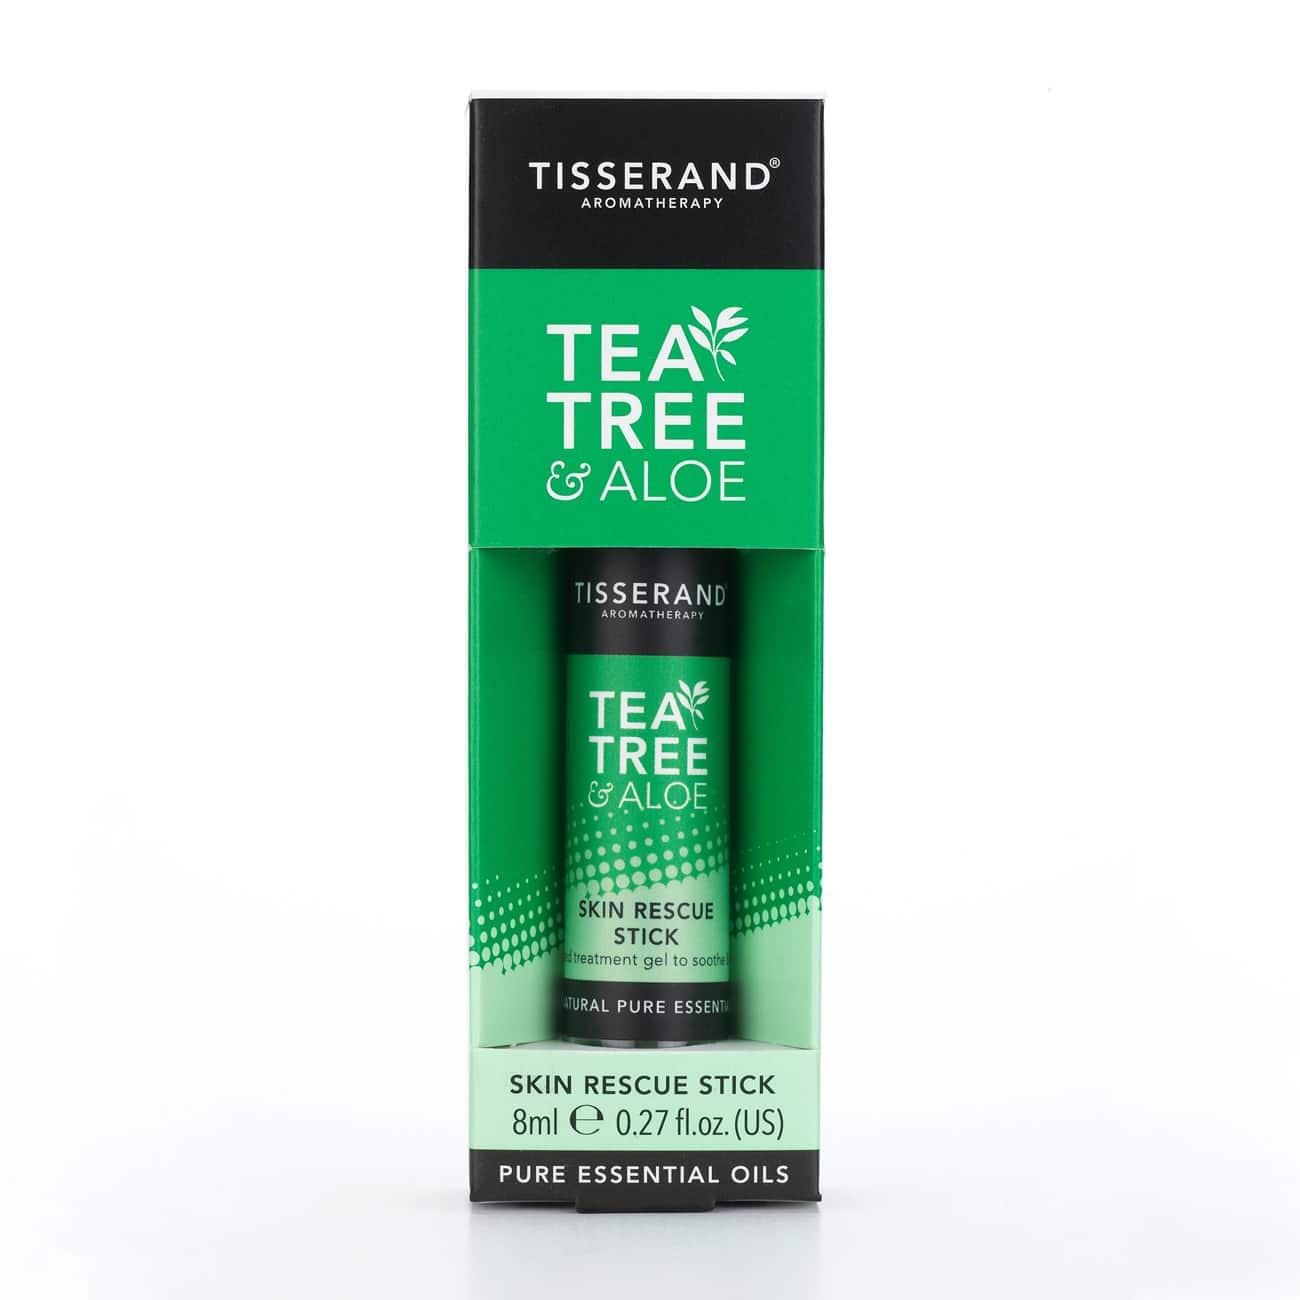 Tea Tree Anti-Blemish Stick